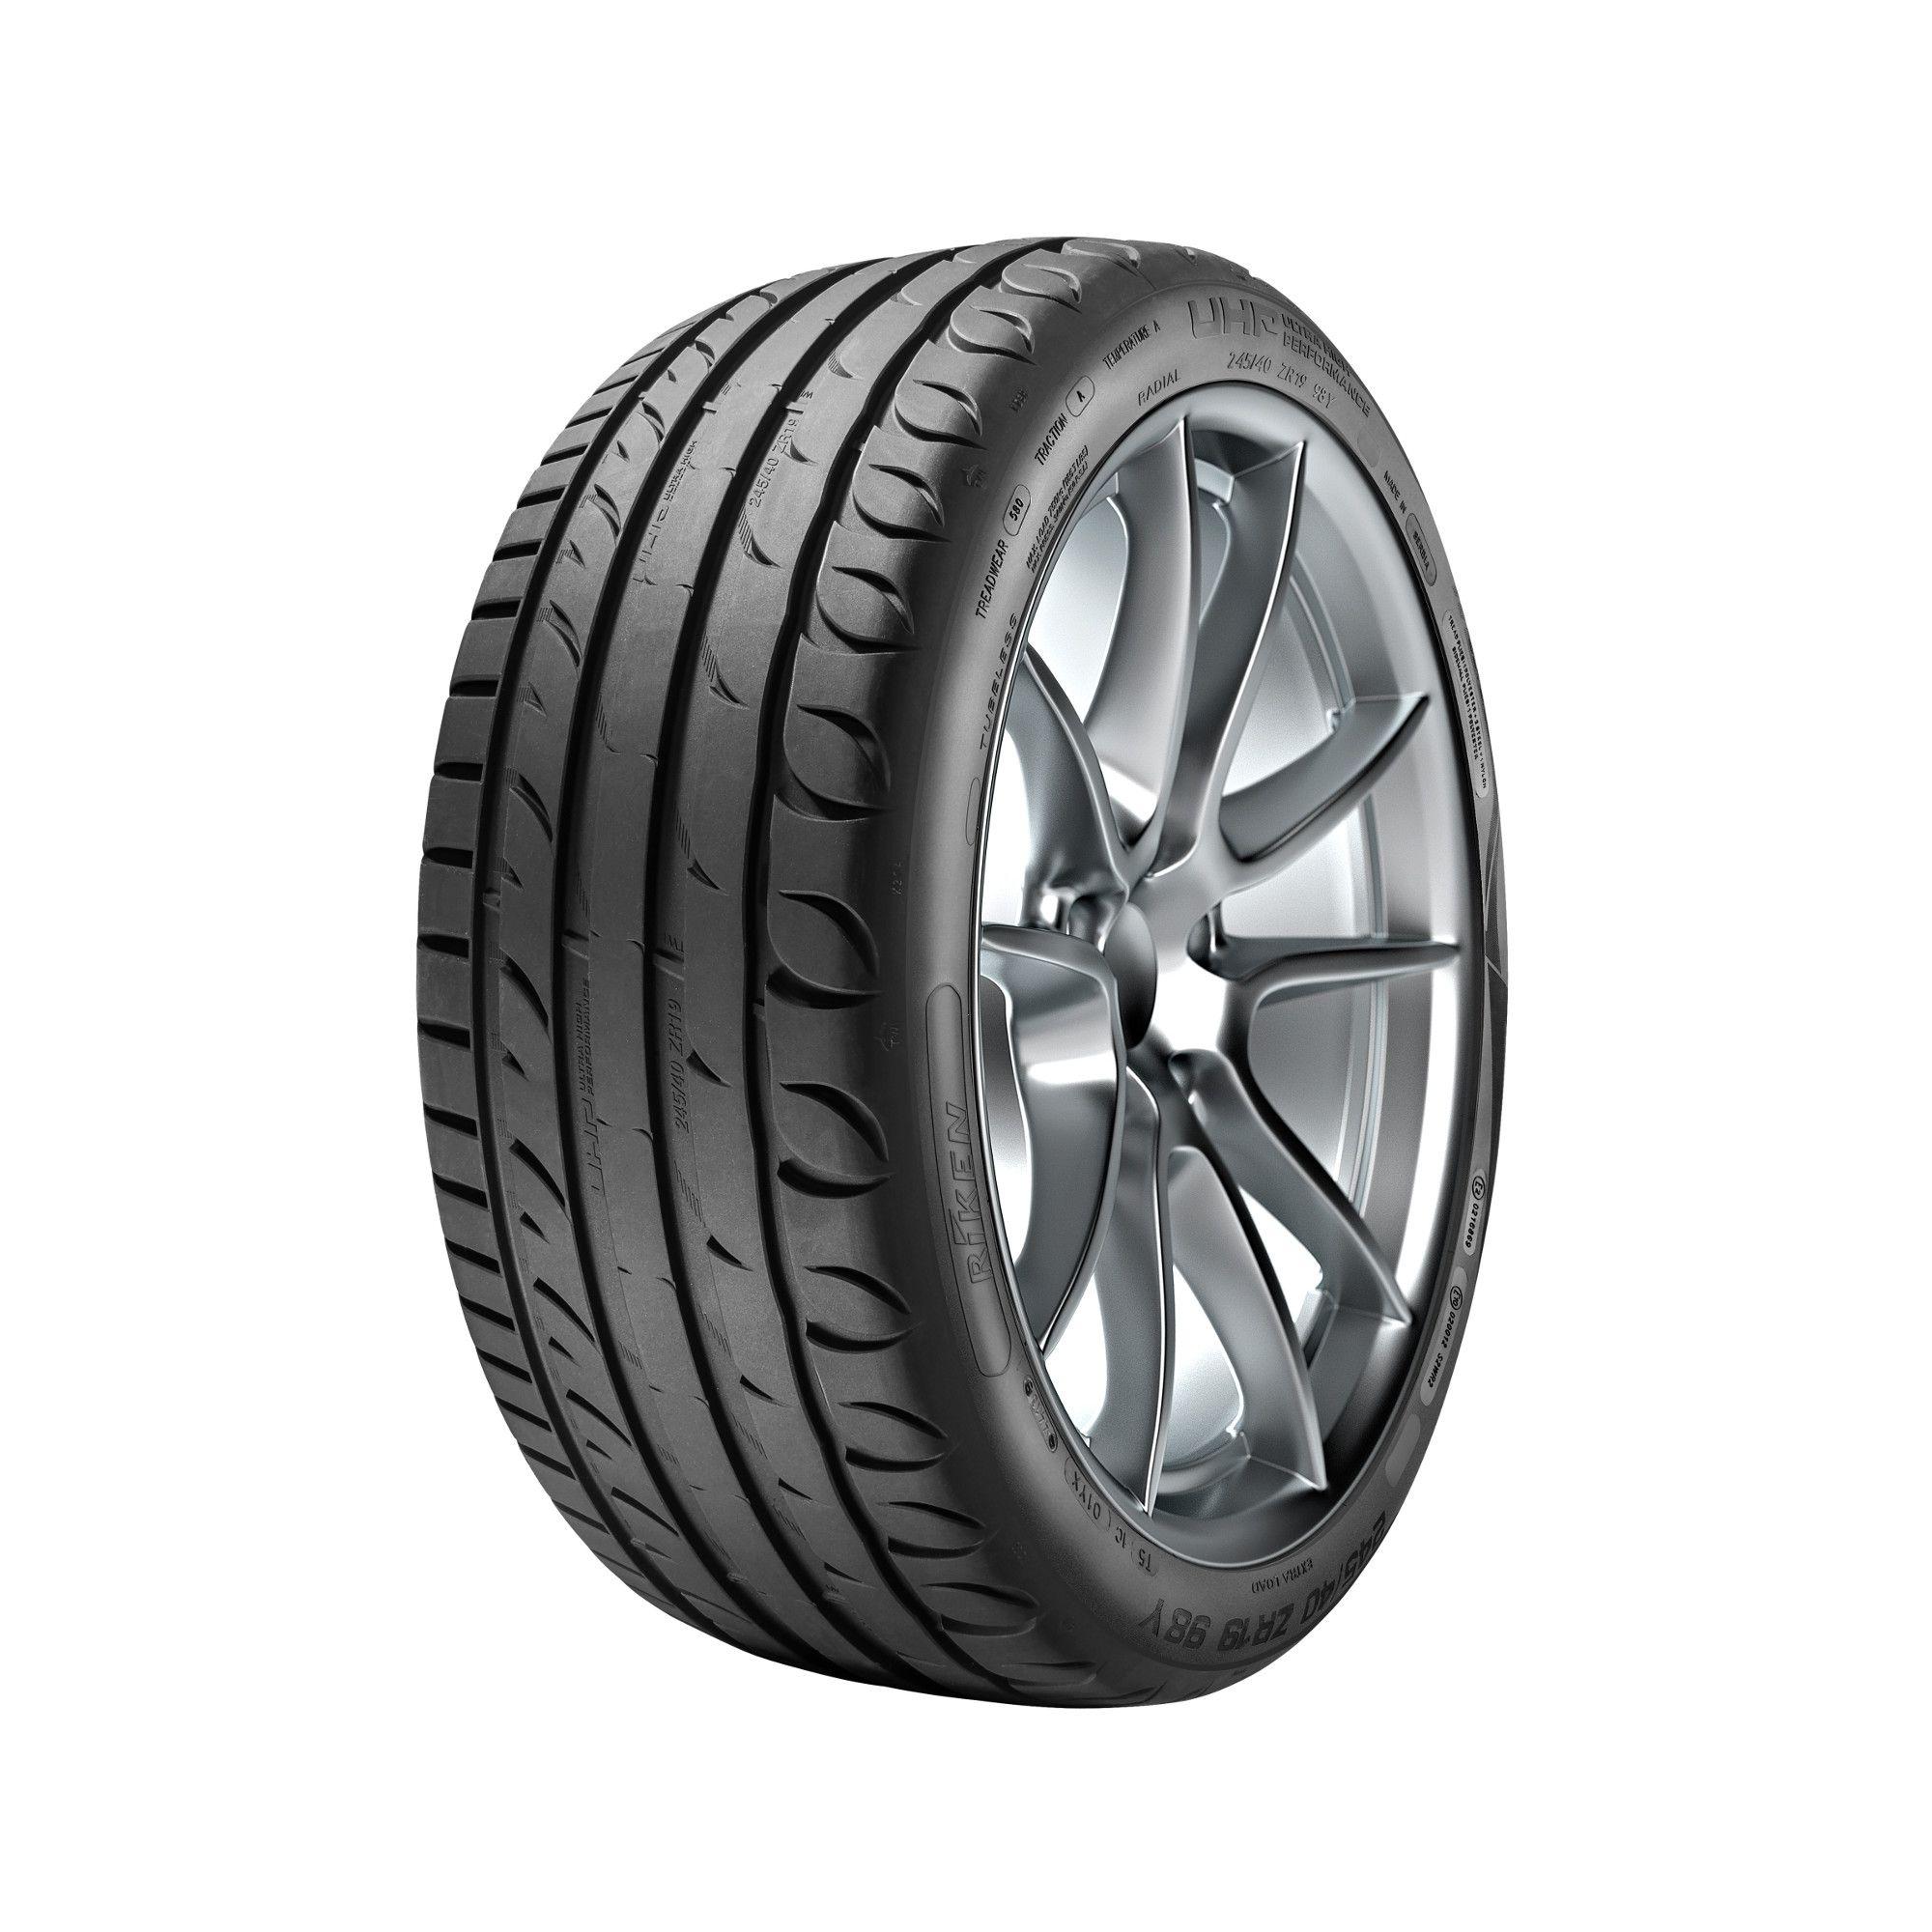 Anvelopa vara RIKEN UHP XL (By Michelin) 235/45 R17 97Y